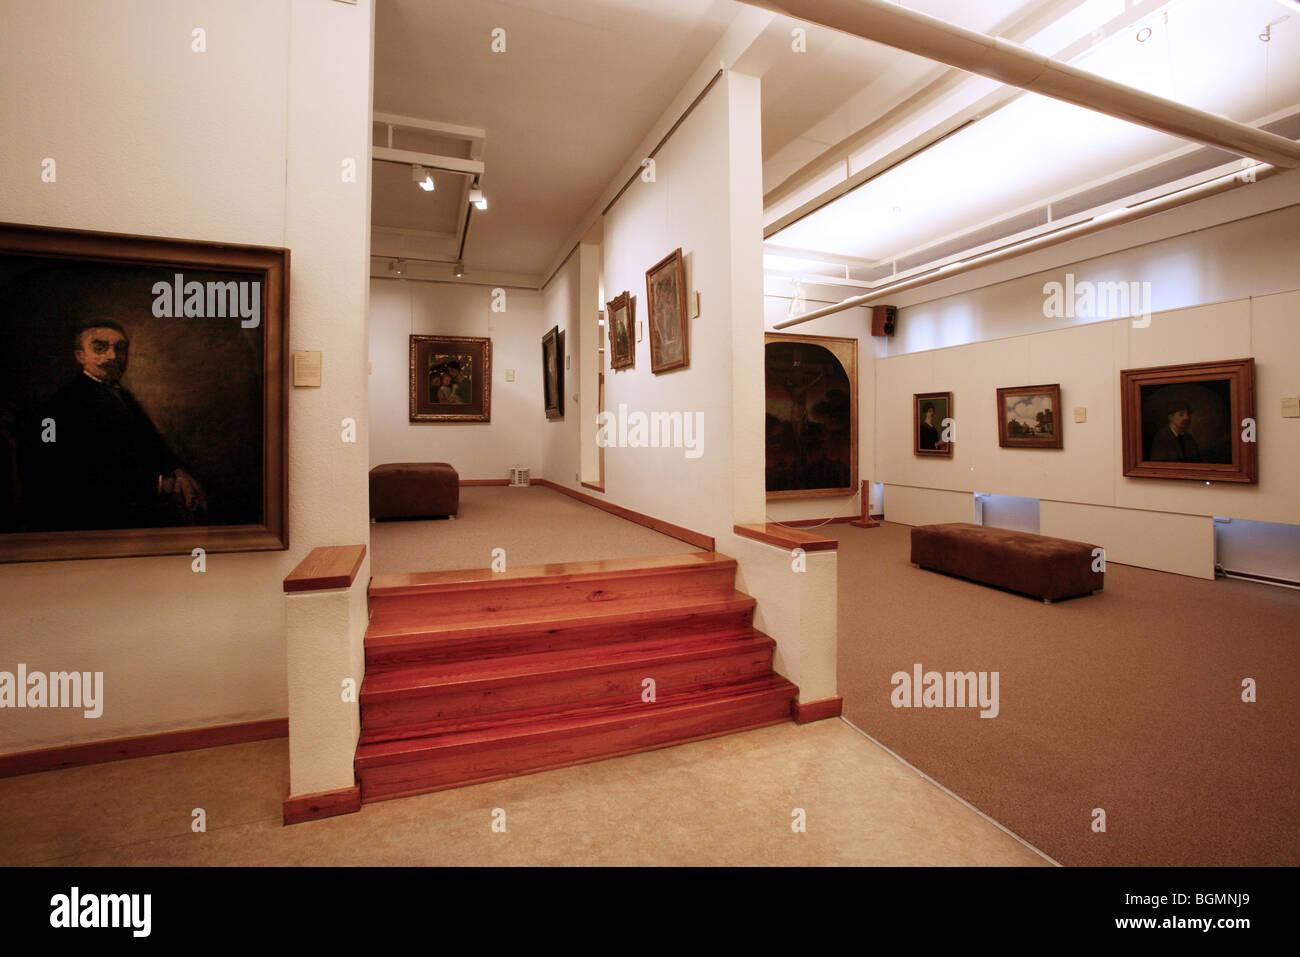 https://c8.alamy.com/comp/BGMNJ9/paintings-in-the-jacob-smits-museum-sluis-mol-belgium-BGMNJ9.jpg